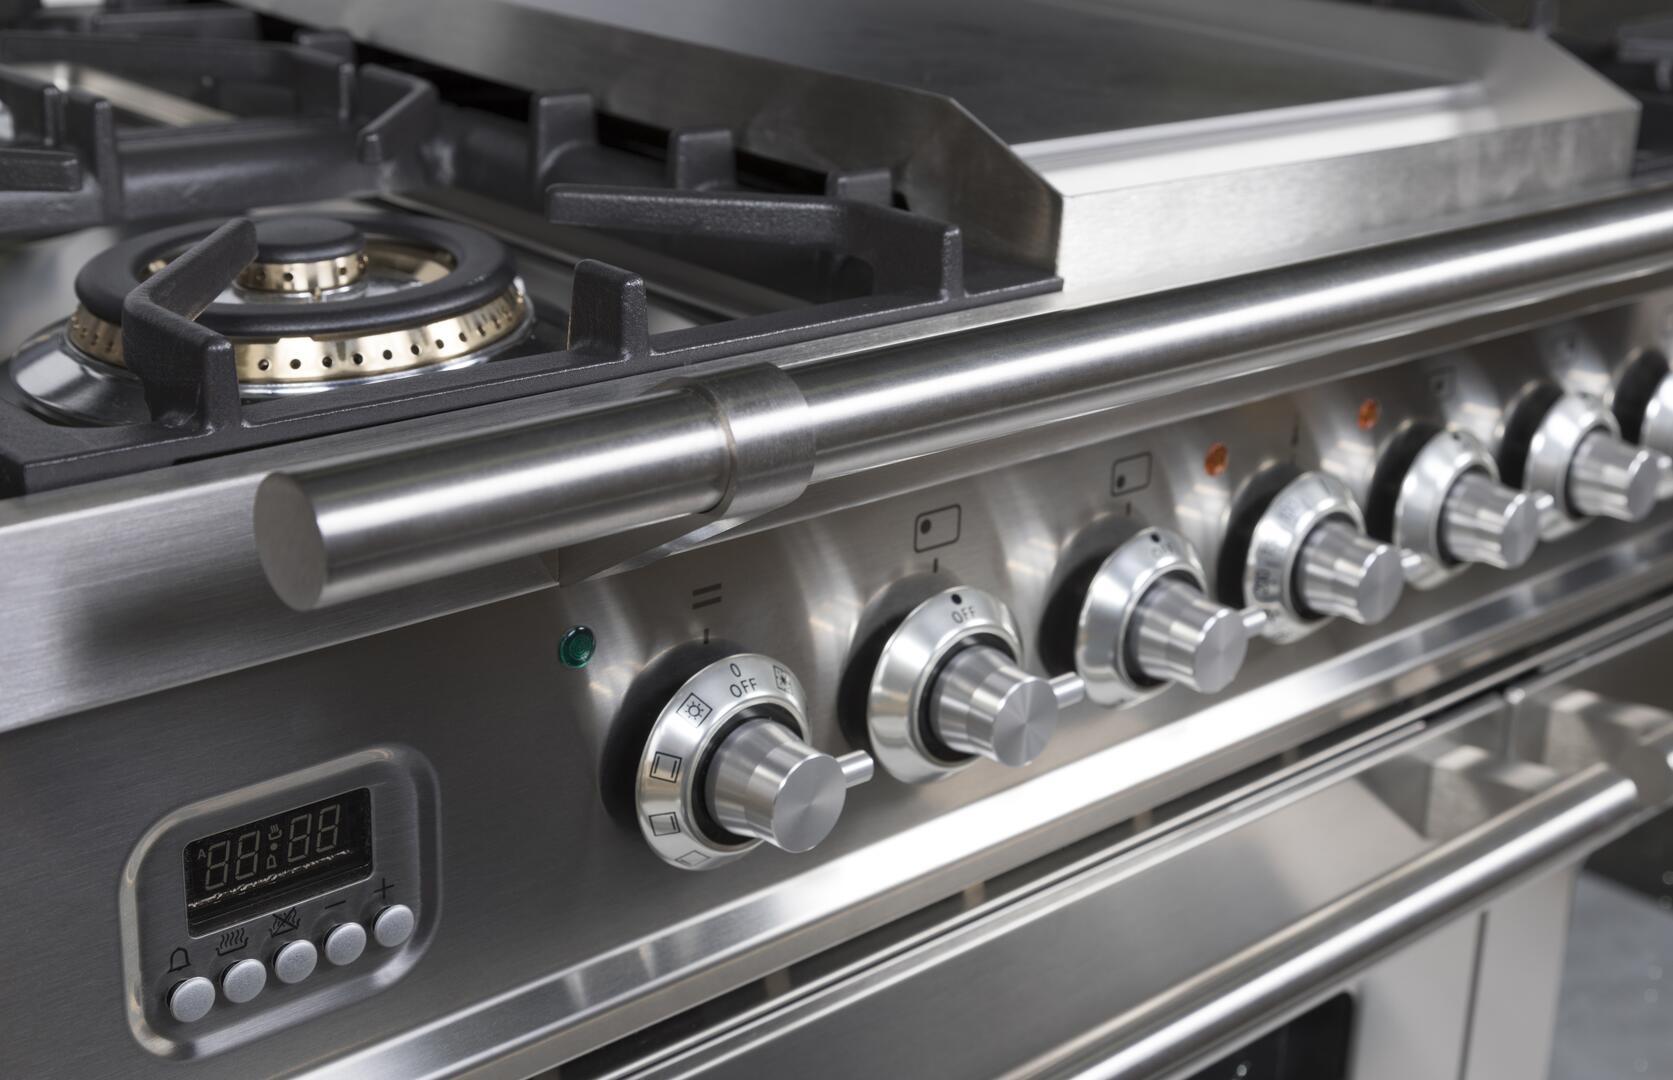 Ilve Professional Plus UPDW90FDMPILP Freestanding Dual Fuel Range Stainless Steel, 9